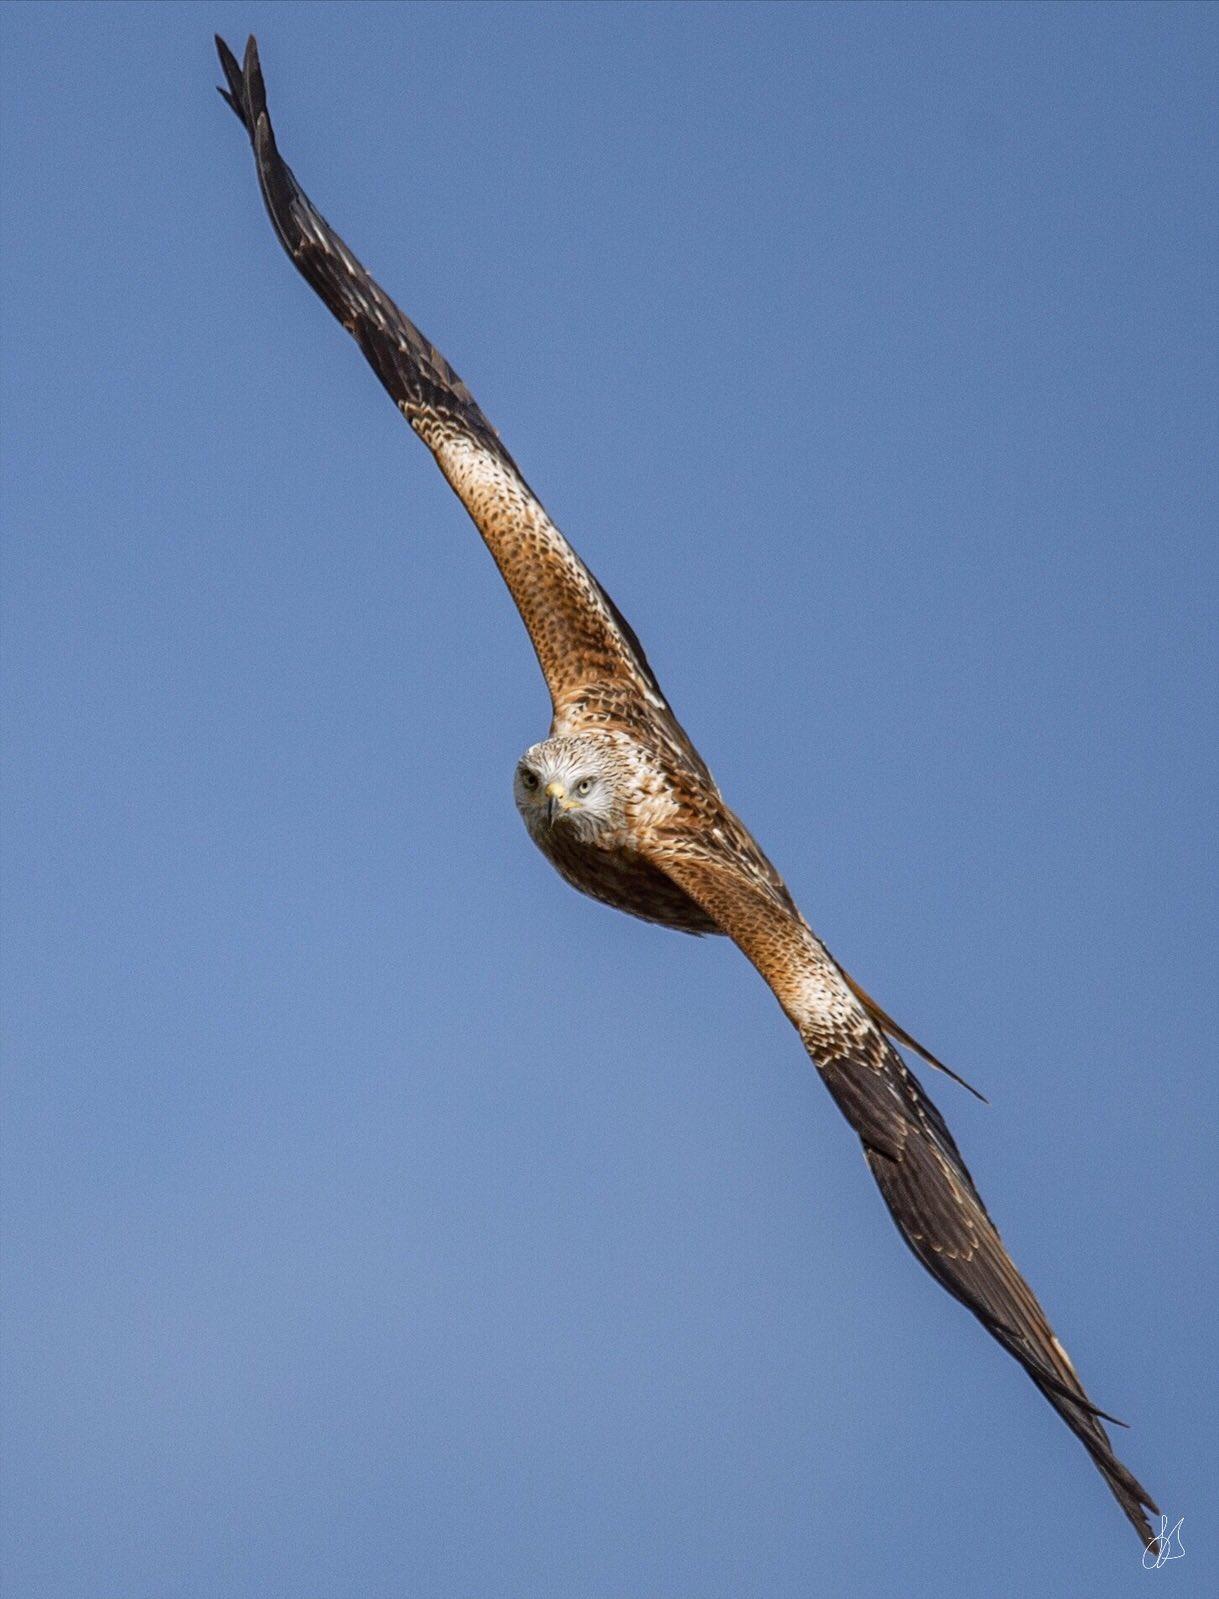 bird_photography_12.jpg